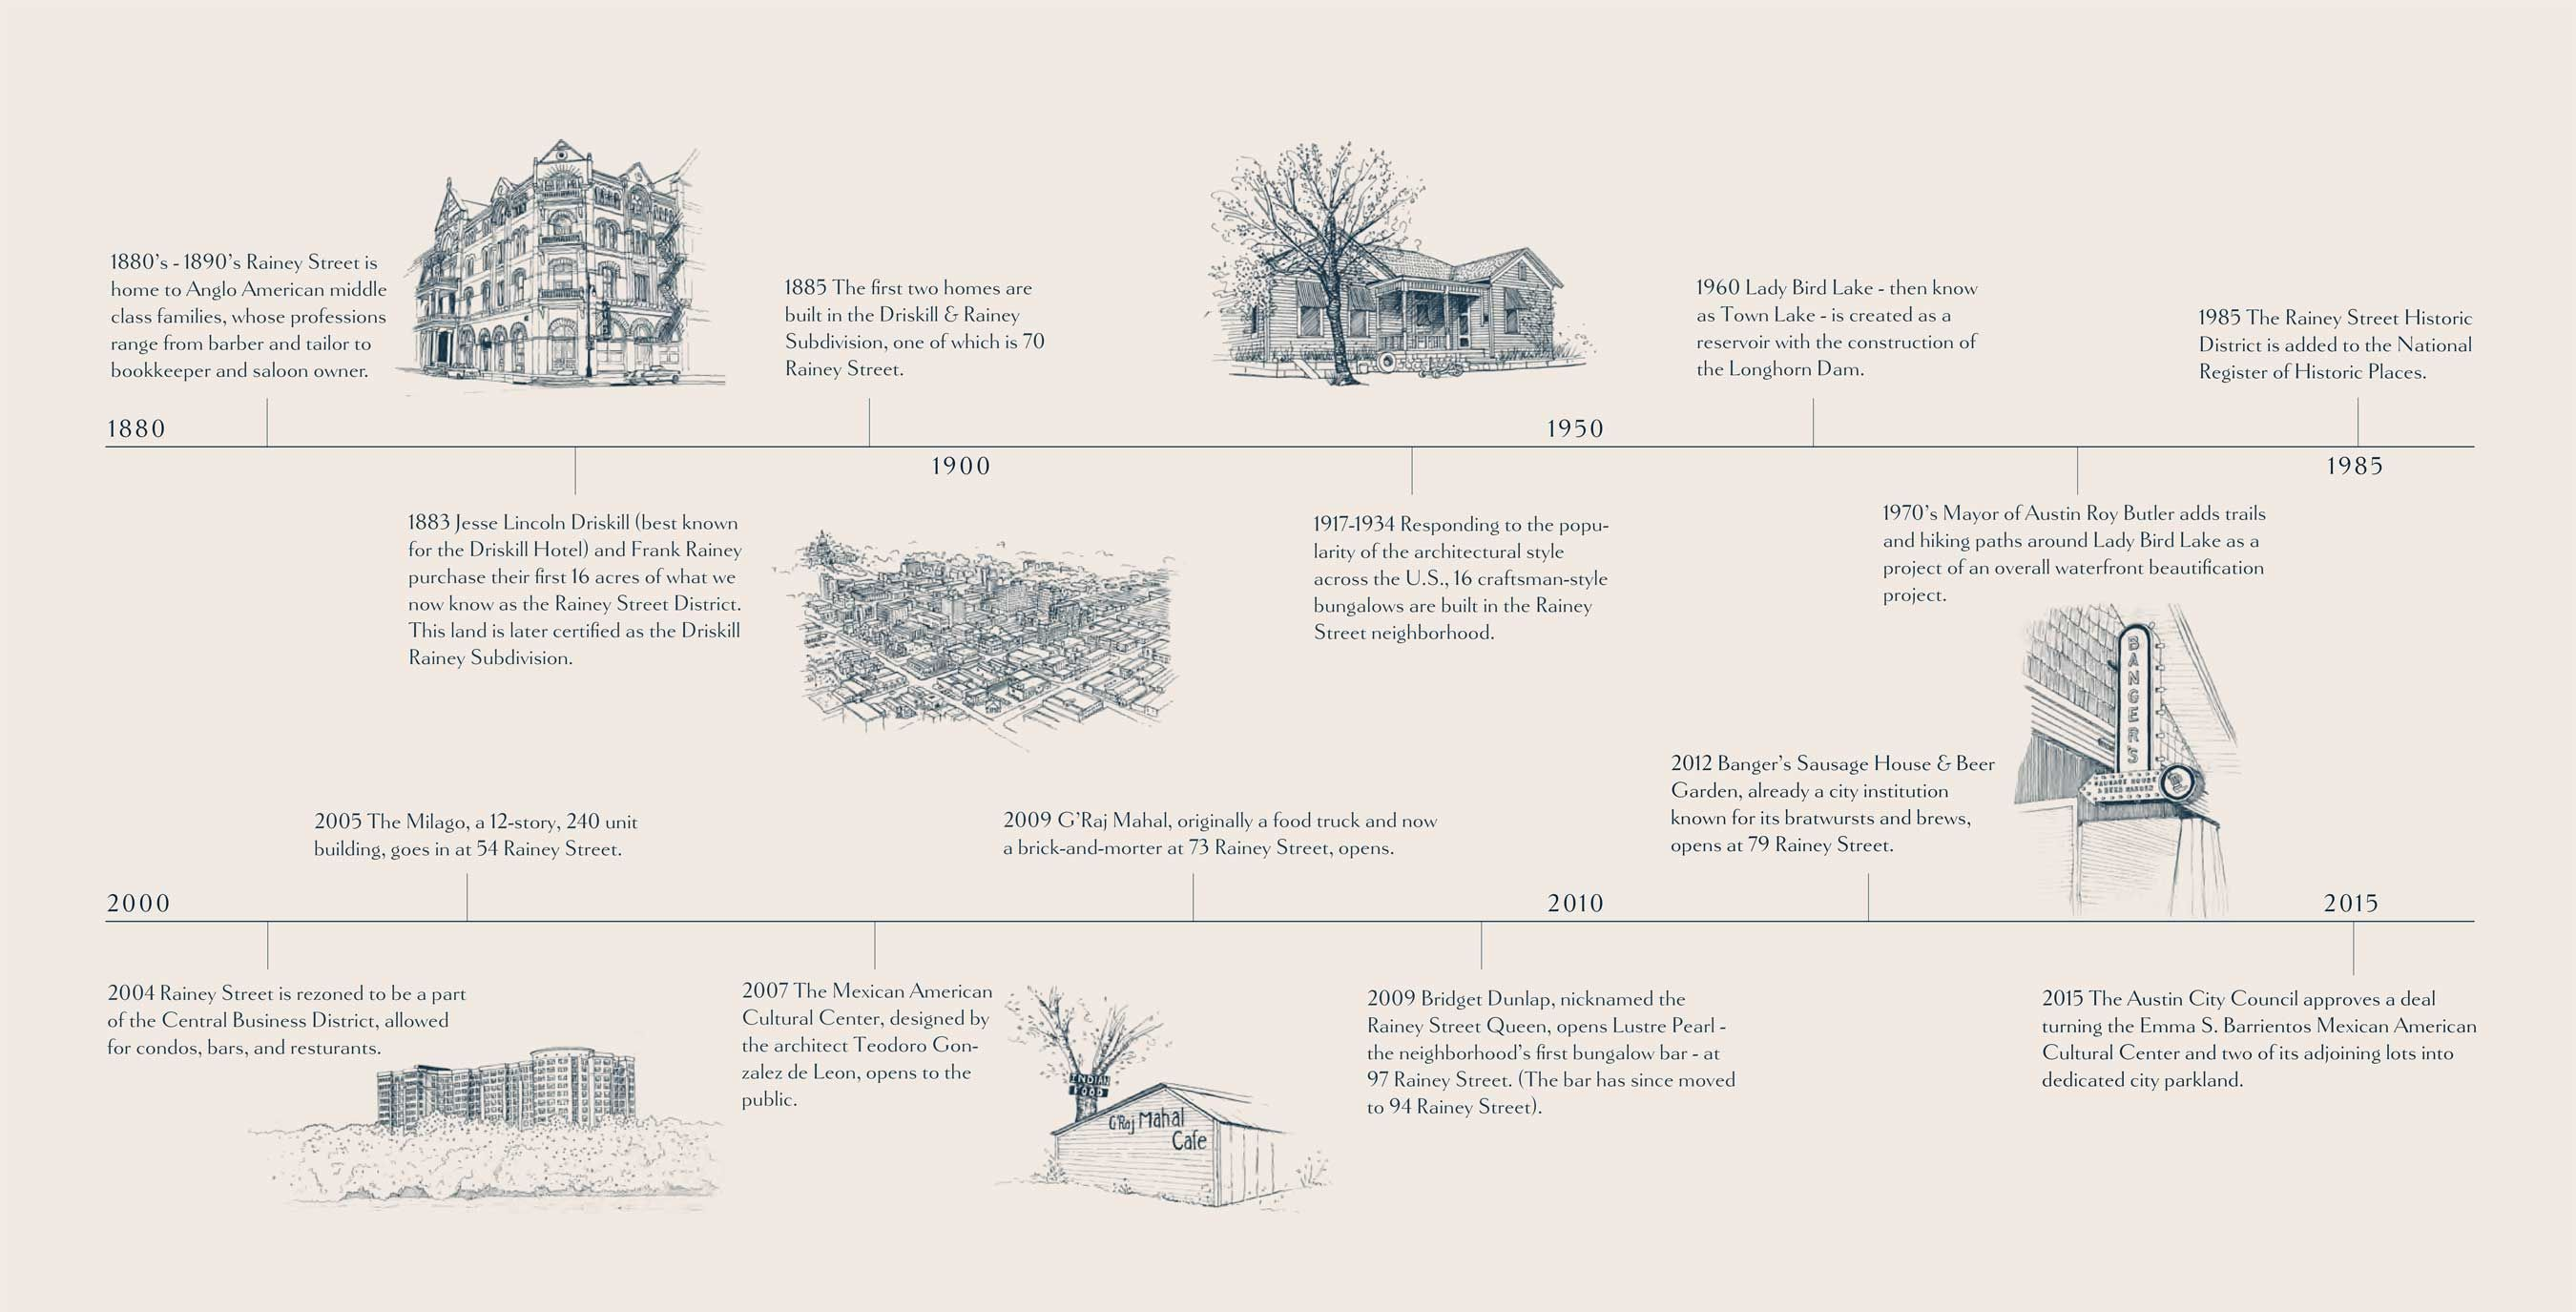 Rainey Street Austin History Timeline